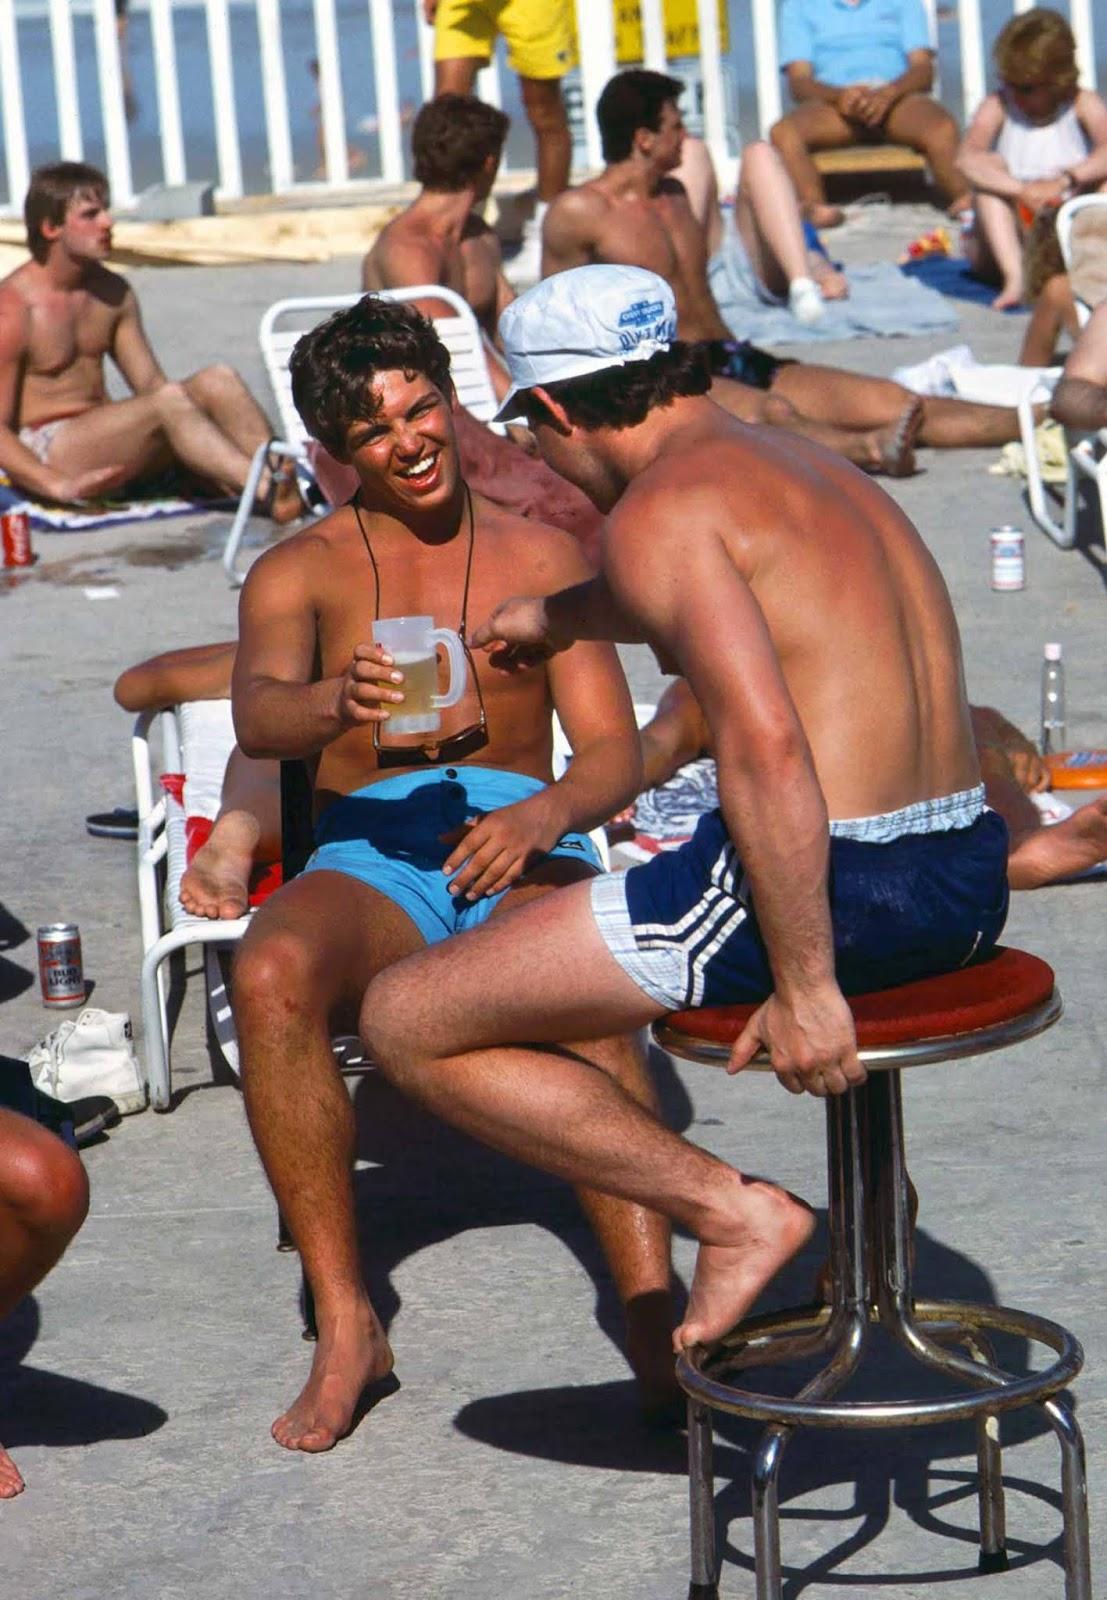 Sharing beers. 1983.